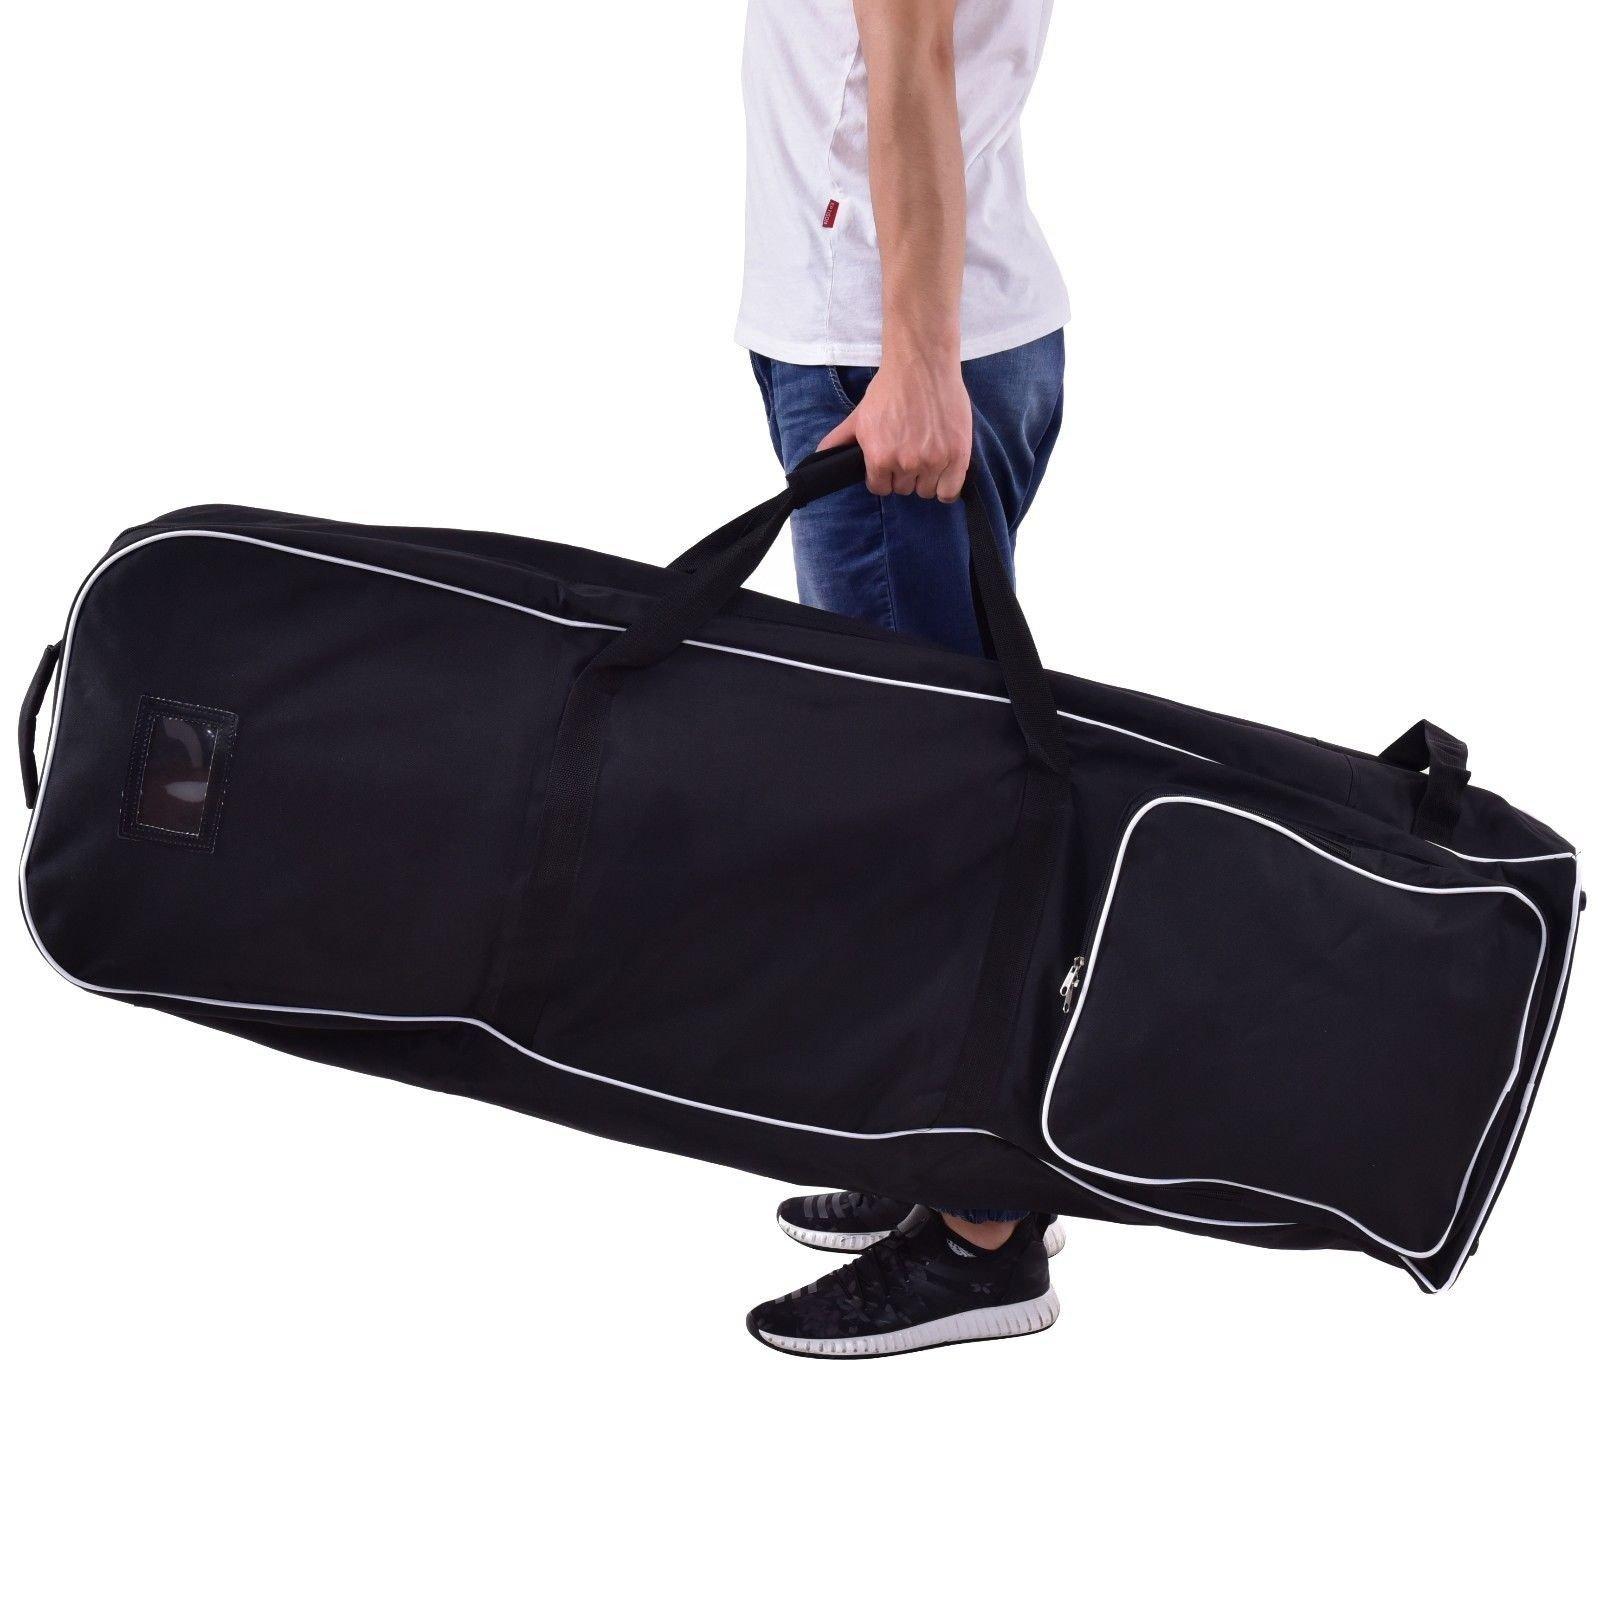 Custpromo Foldable Golf Bag Travel Cover with Wheel, Black